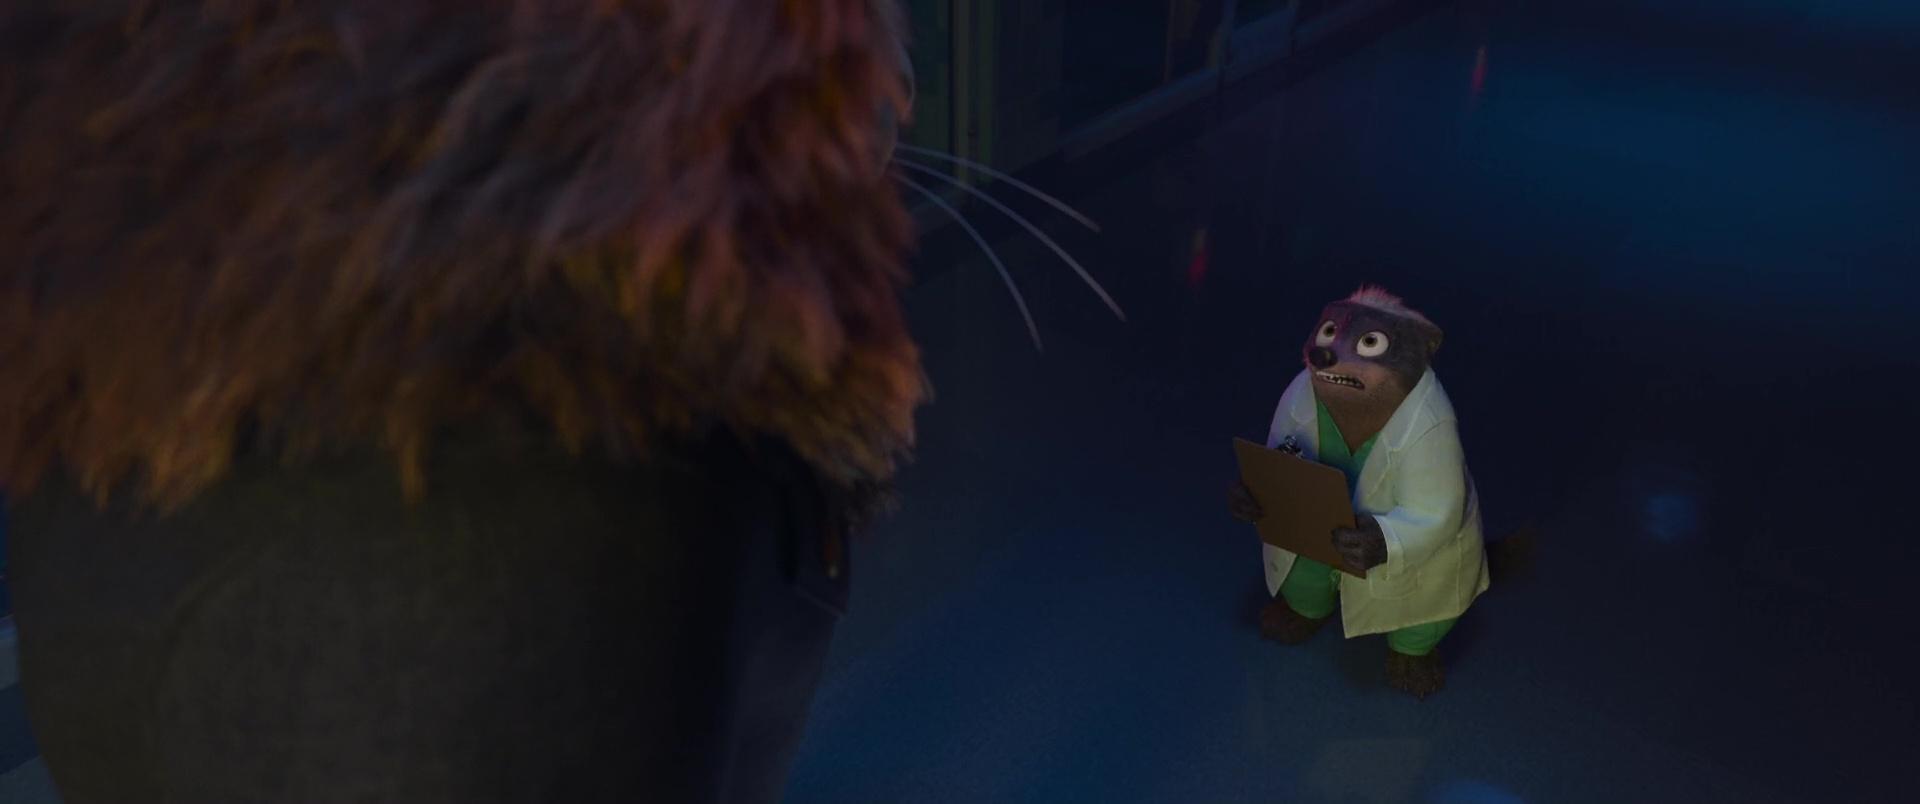 docteur madge disney personnage character zootopie zootopia